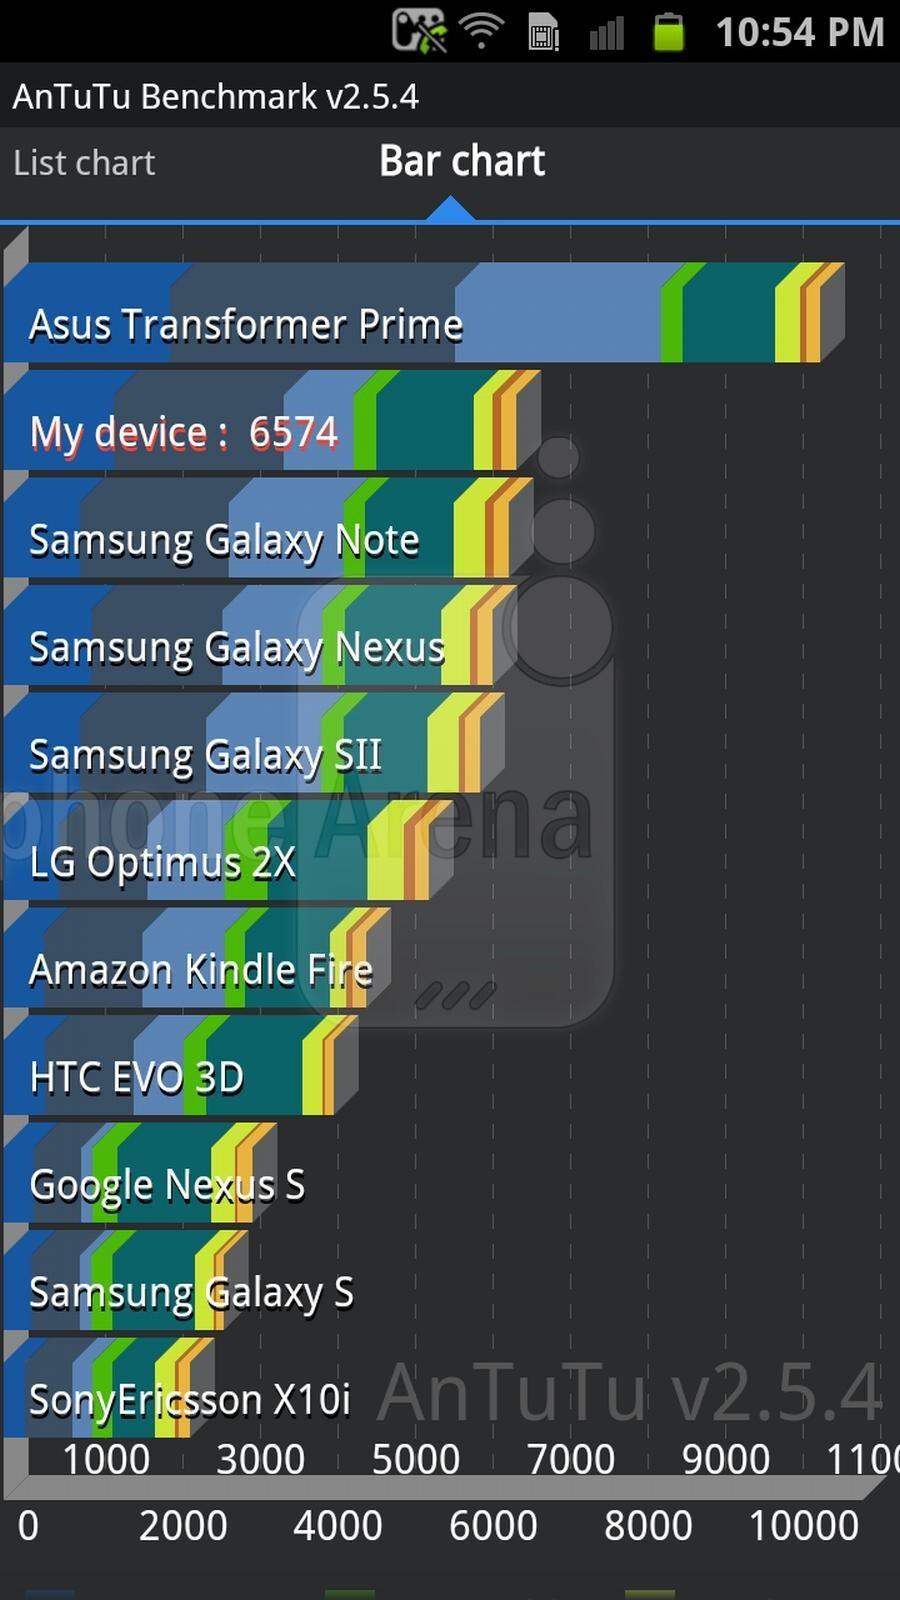 Samsung Galaxy S II HD LTE benchmark tests - PhoneArena